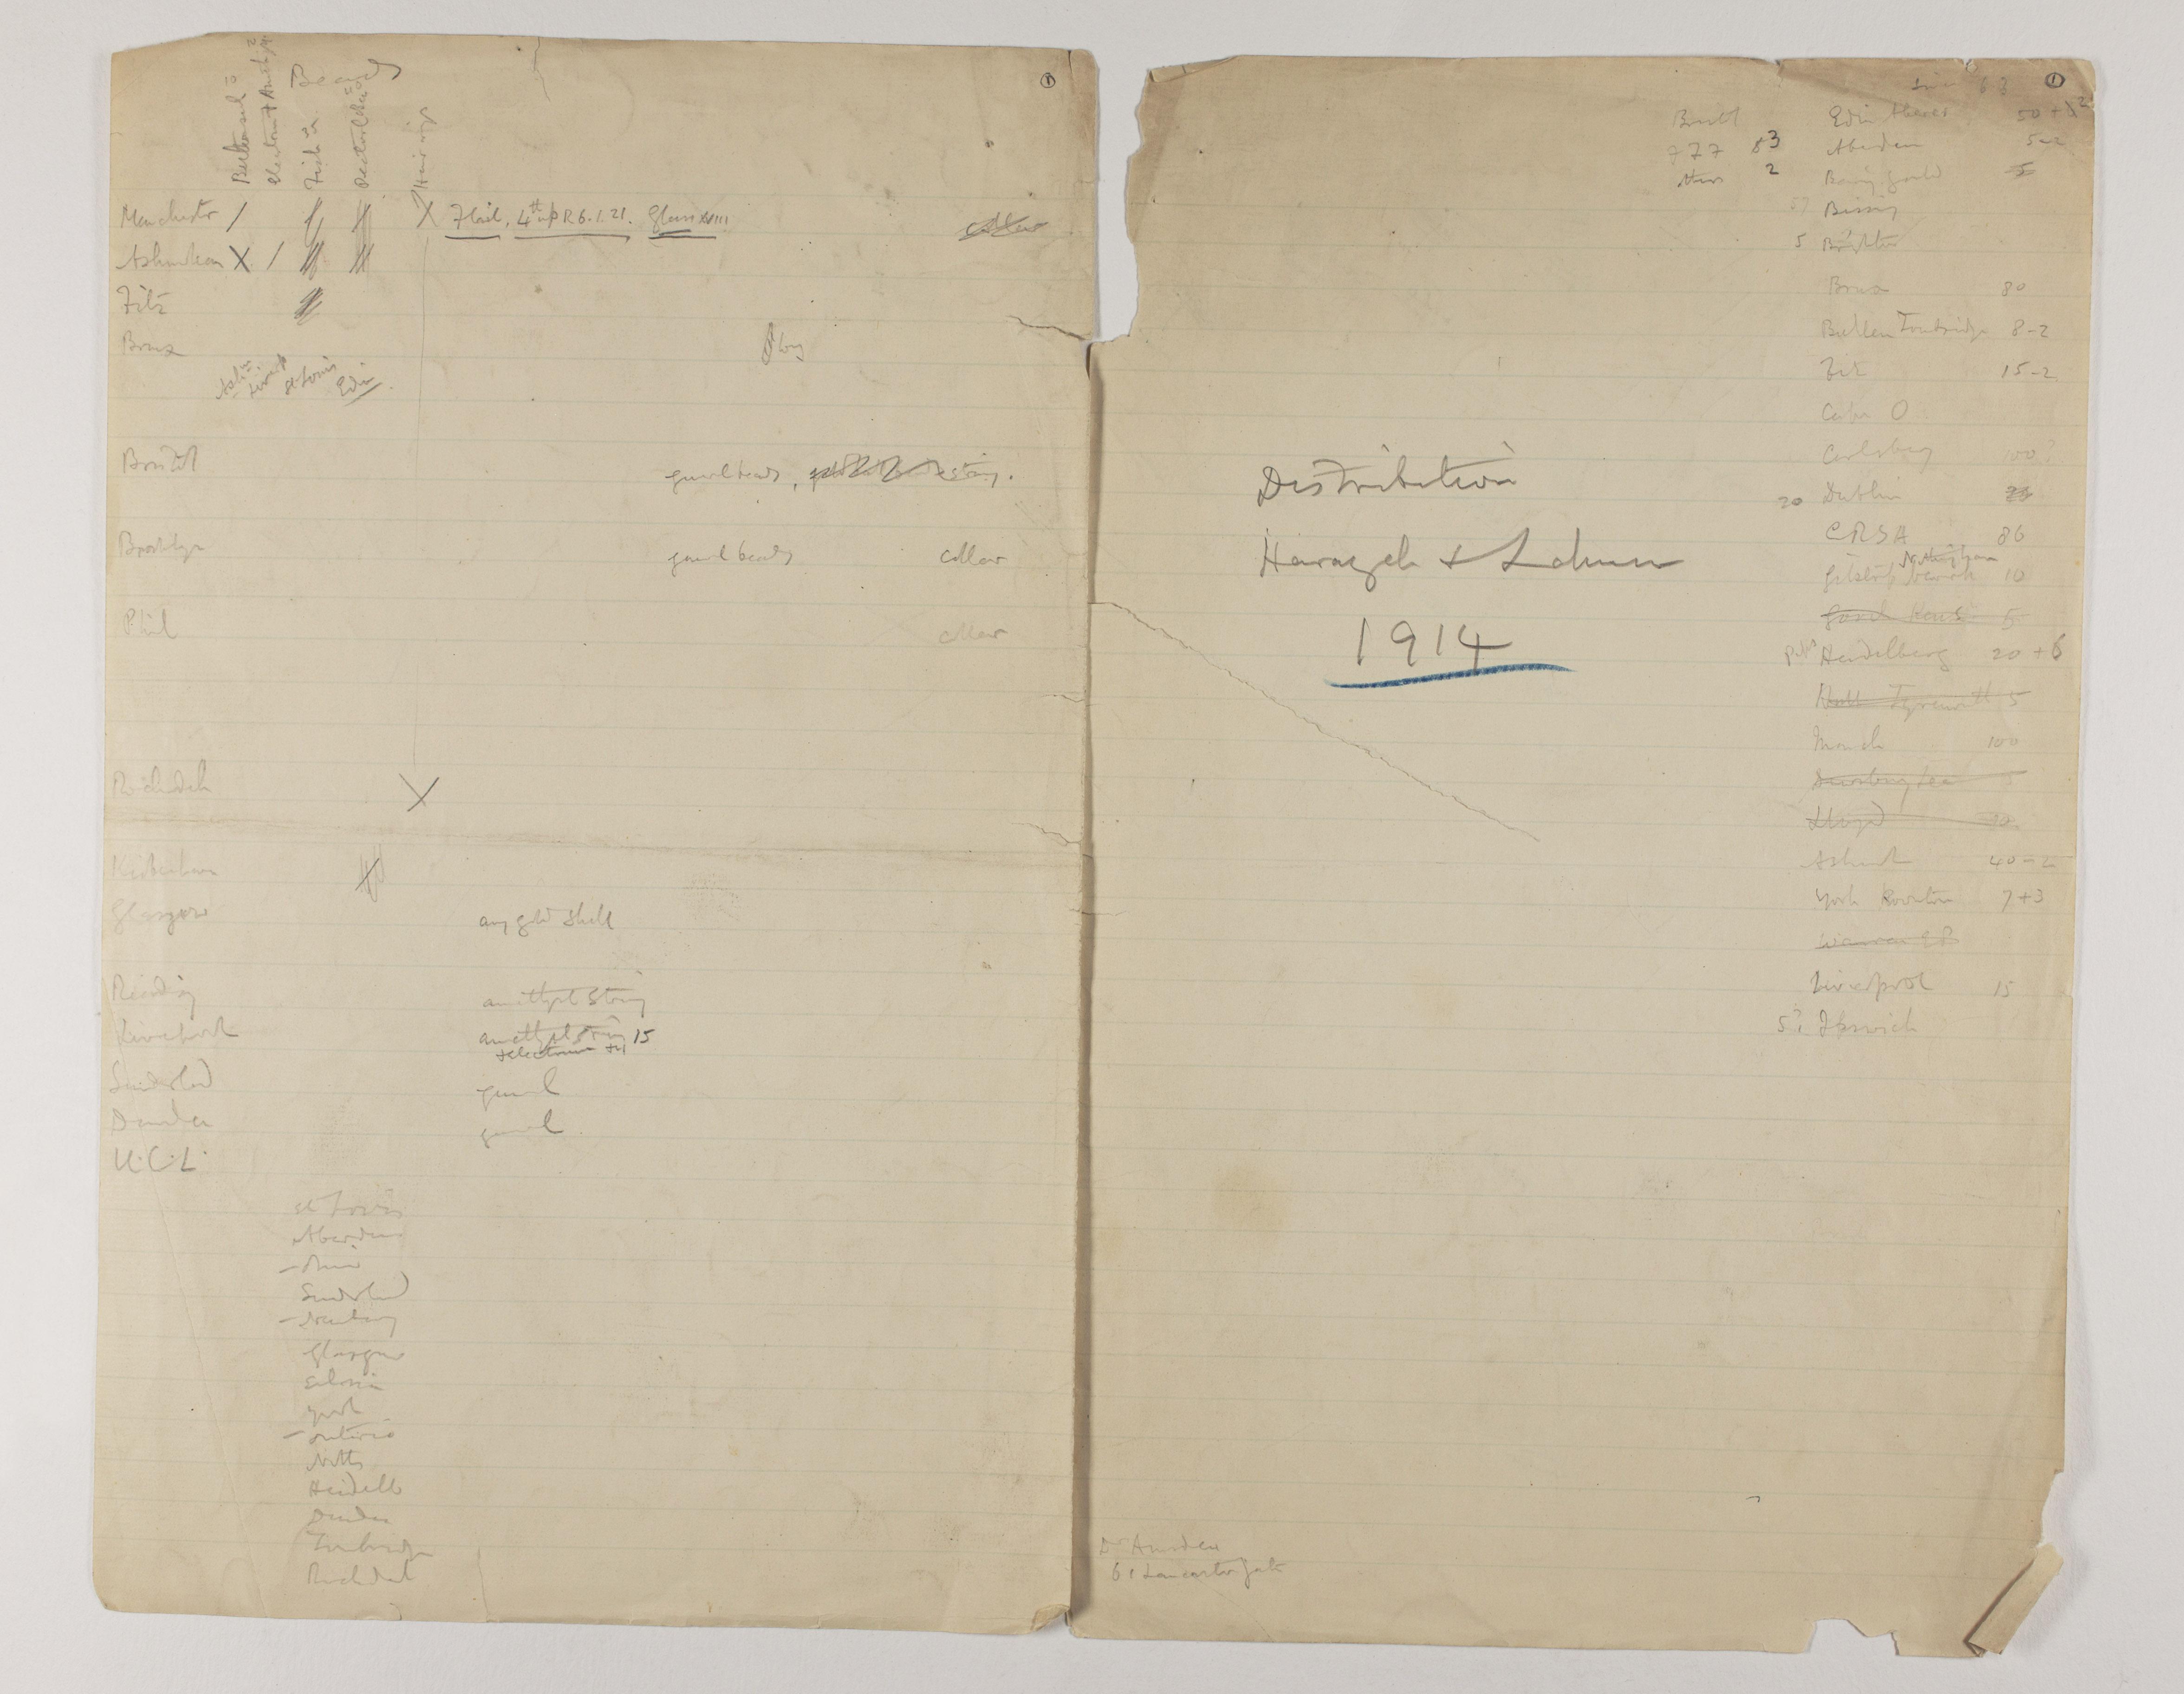 1913-14 Lahun, Haraga Distribution list PMA/WFP1/D/22/1.2